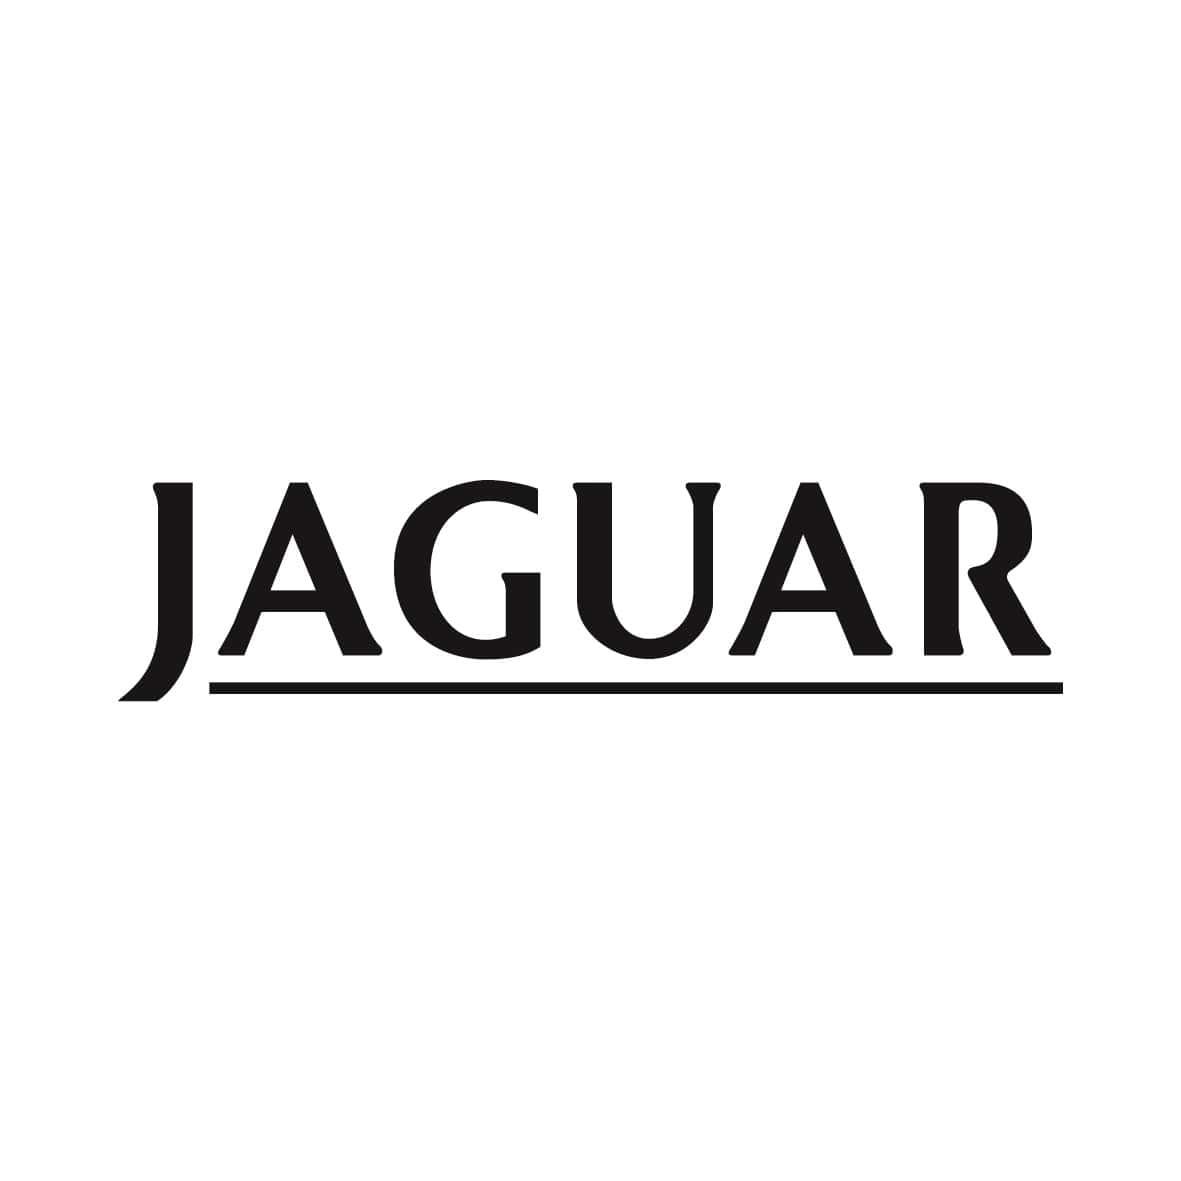 Jaguar ref 5 auto voiture stickers sticker autocollants decals sponsors sport logo tuning racing-min